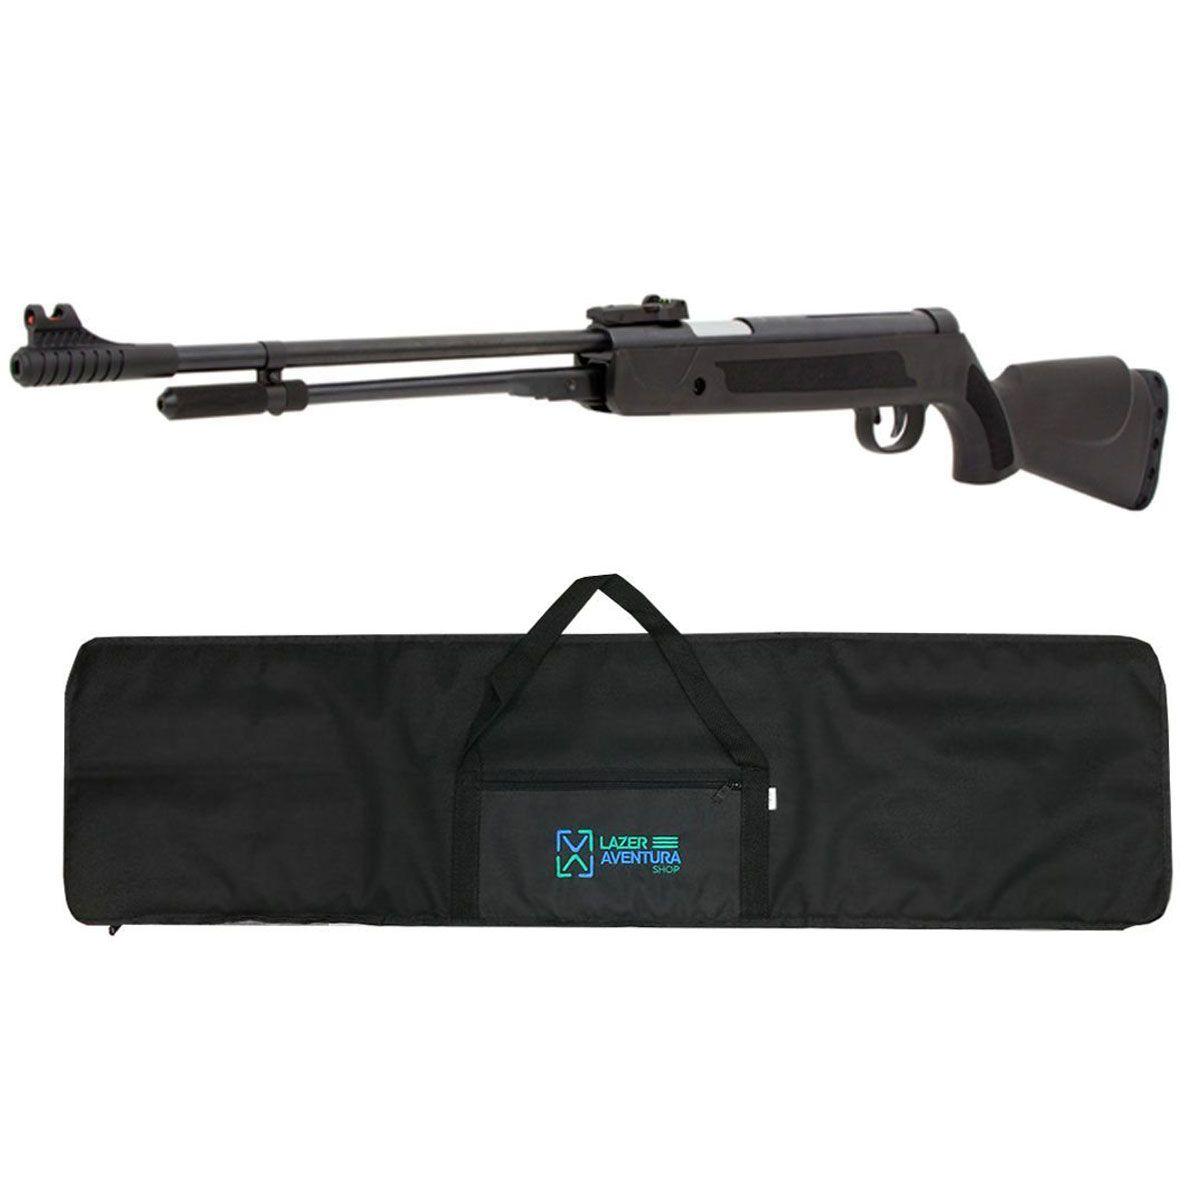 Kit Carabina Fixxar 5,5mm + Capa Lazer e Aventura